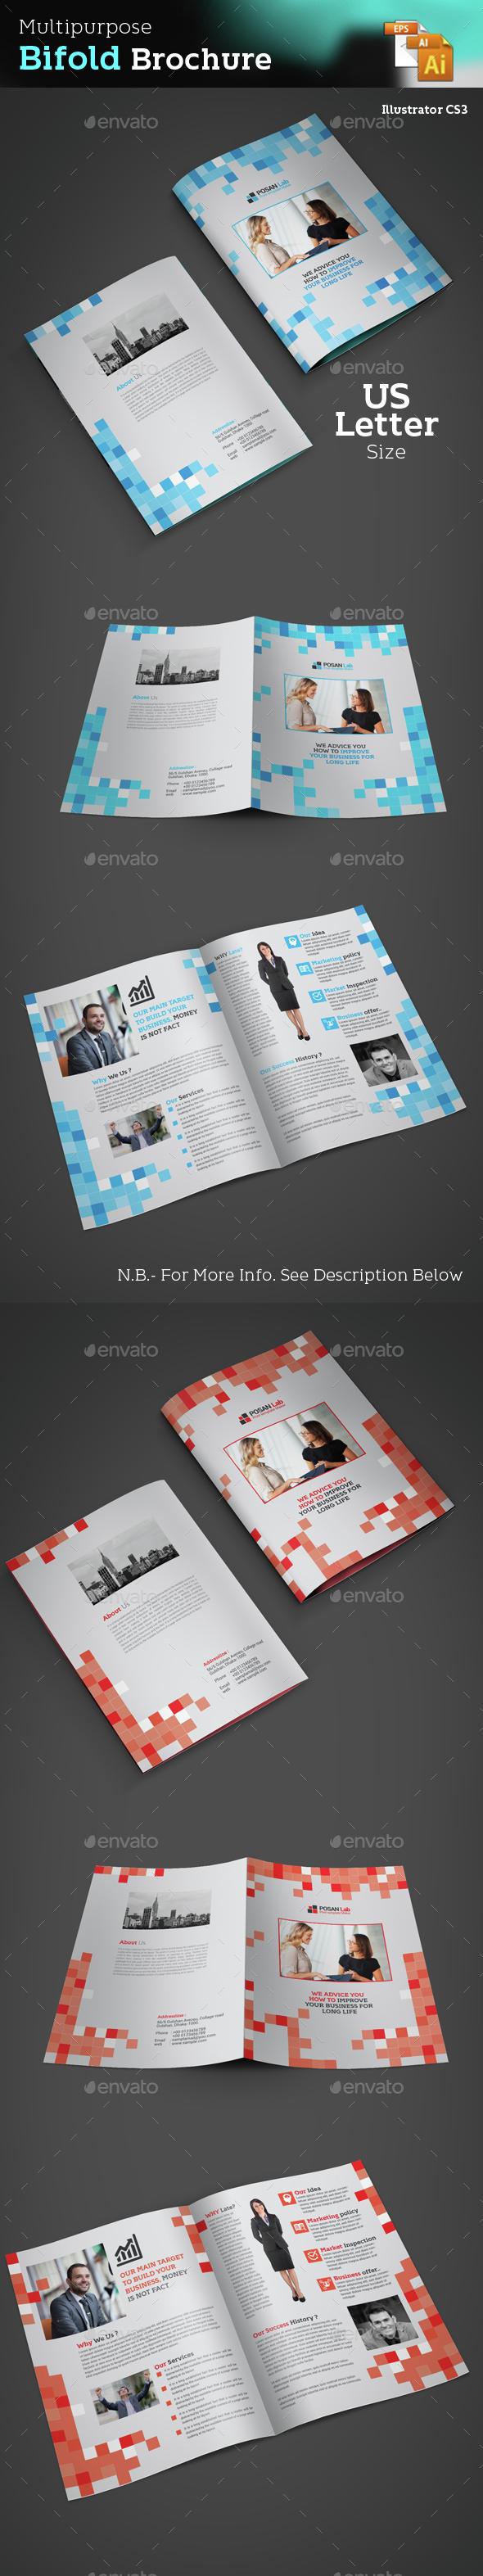 Bifold Business Brochure - Brochures Print Templates